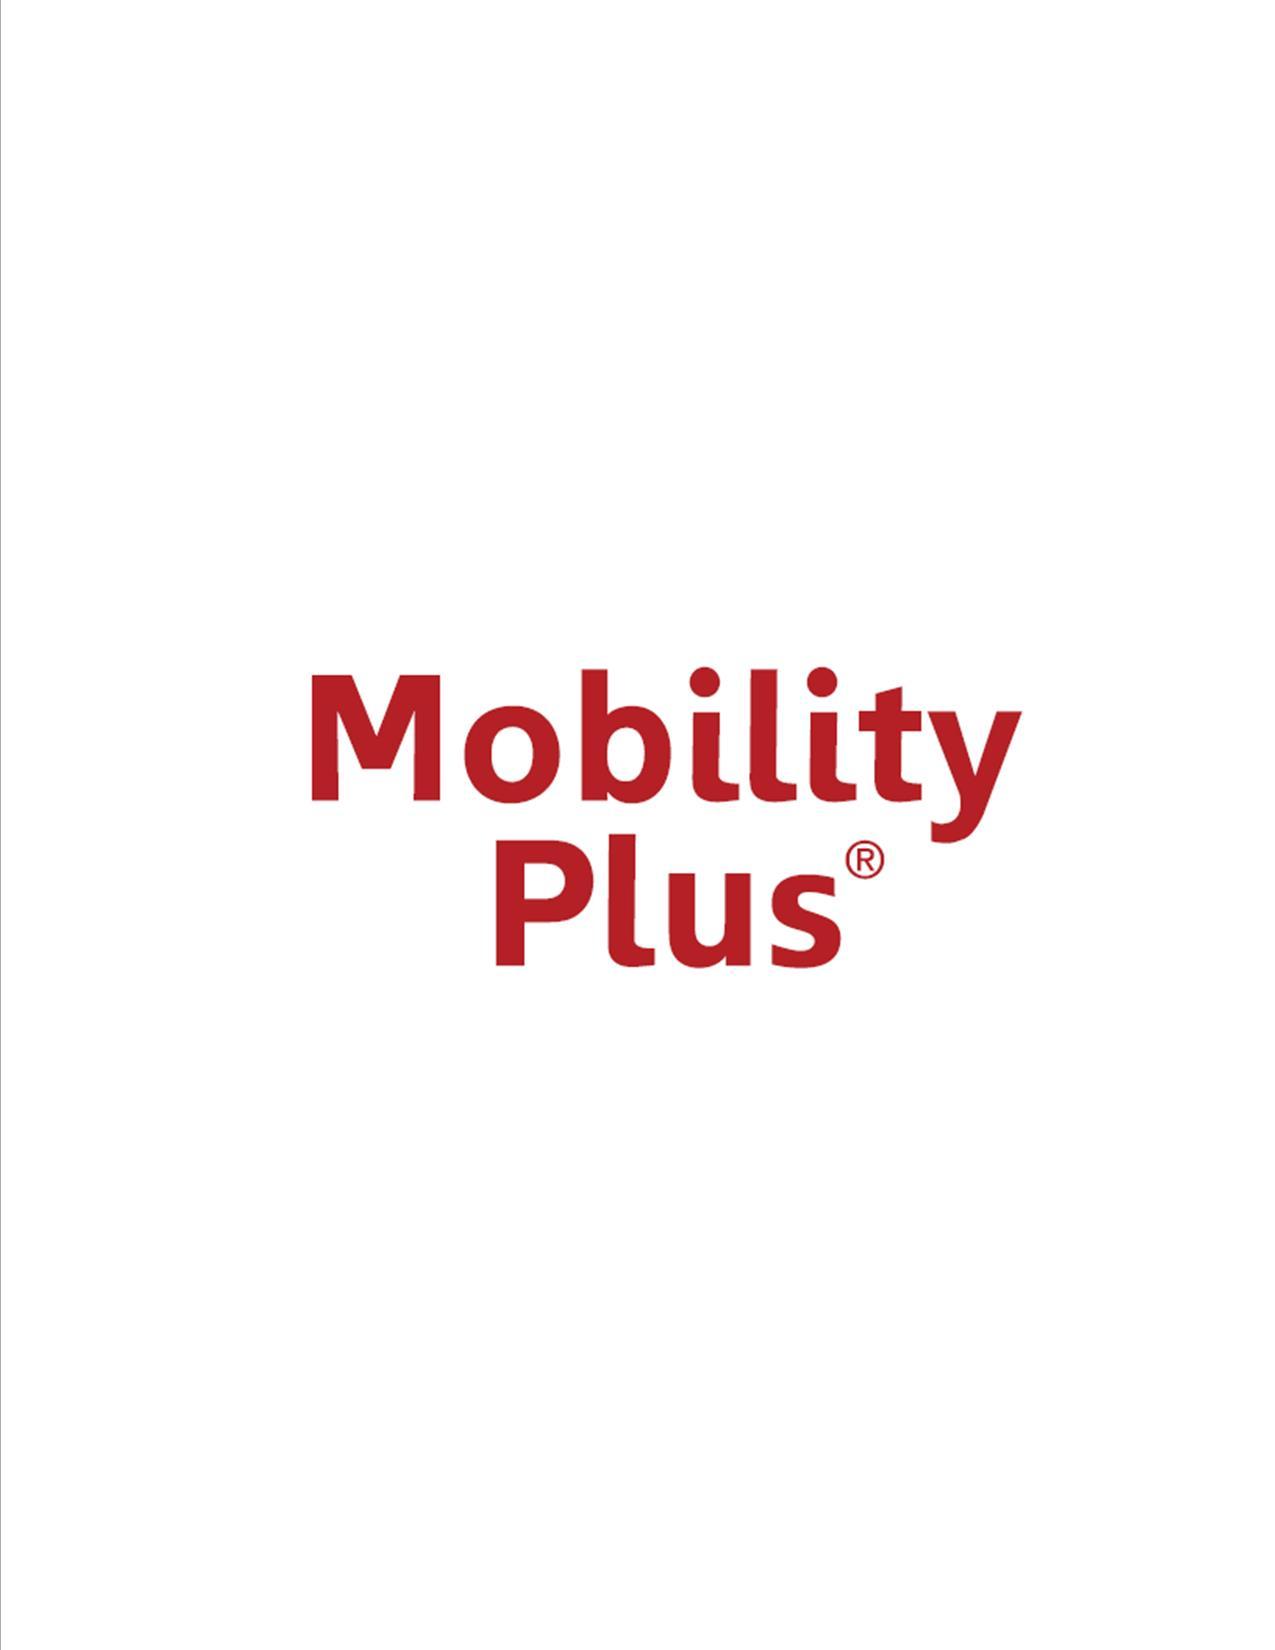 Mobility Plus St. Petersburg